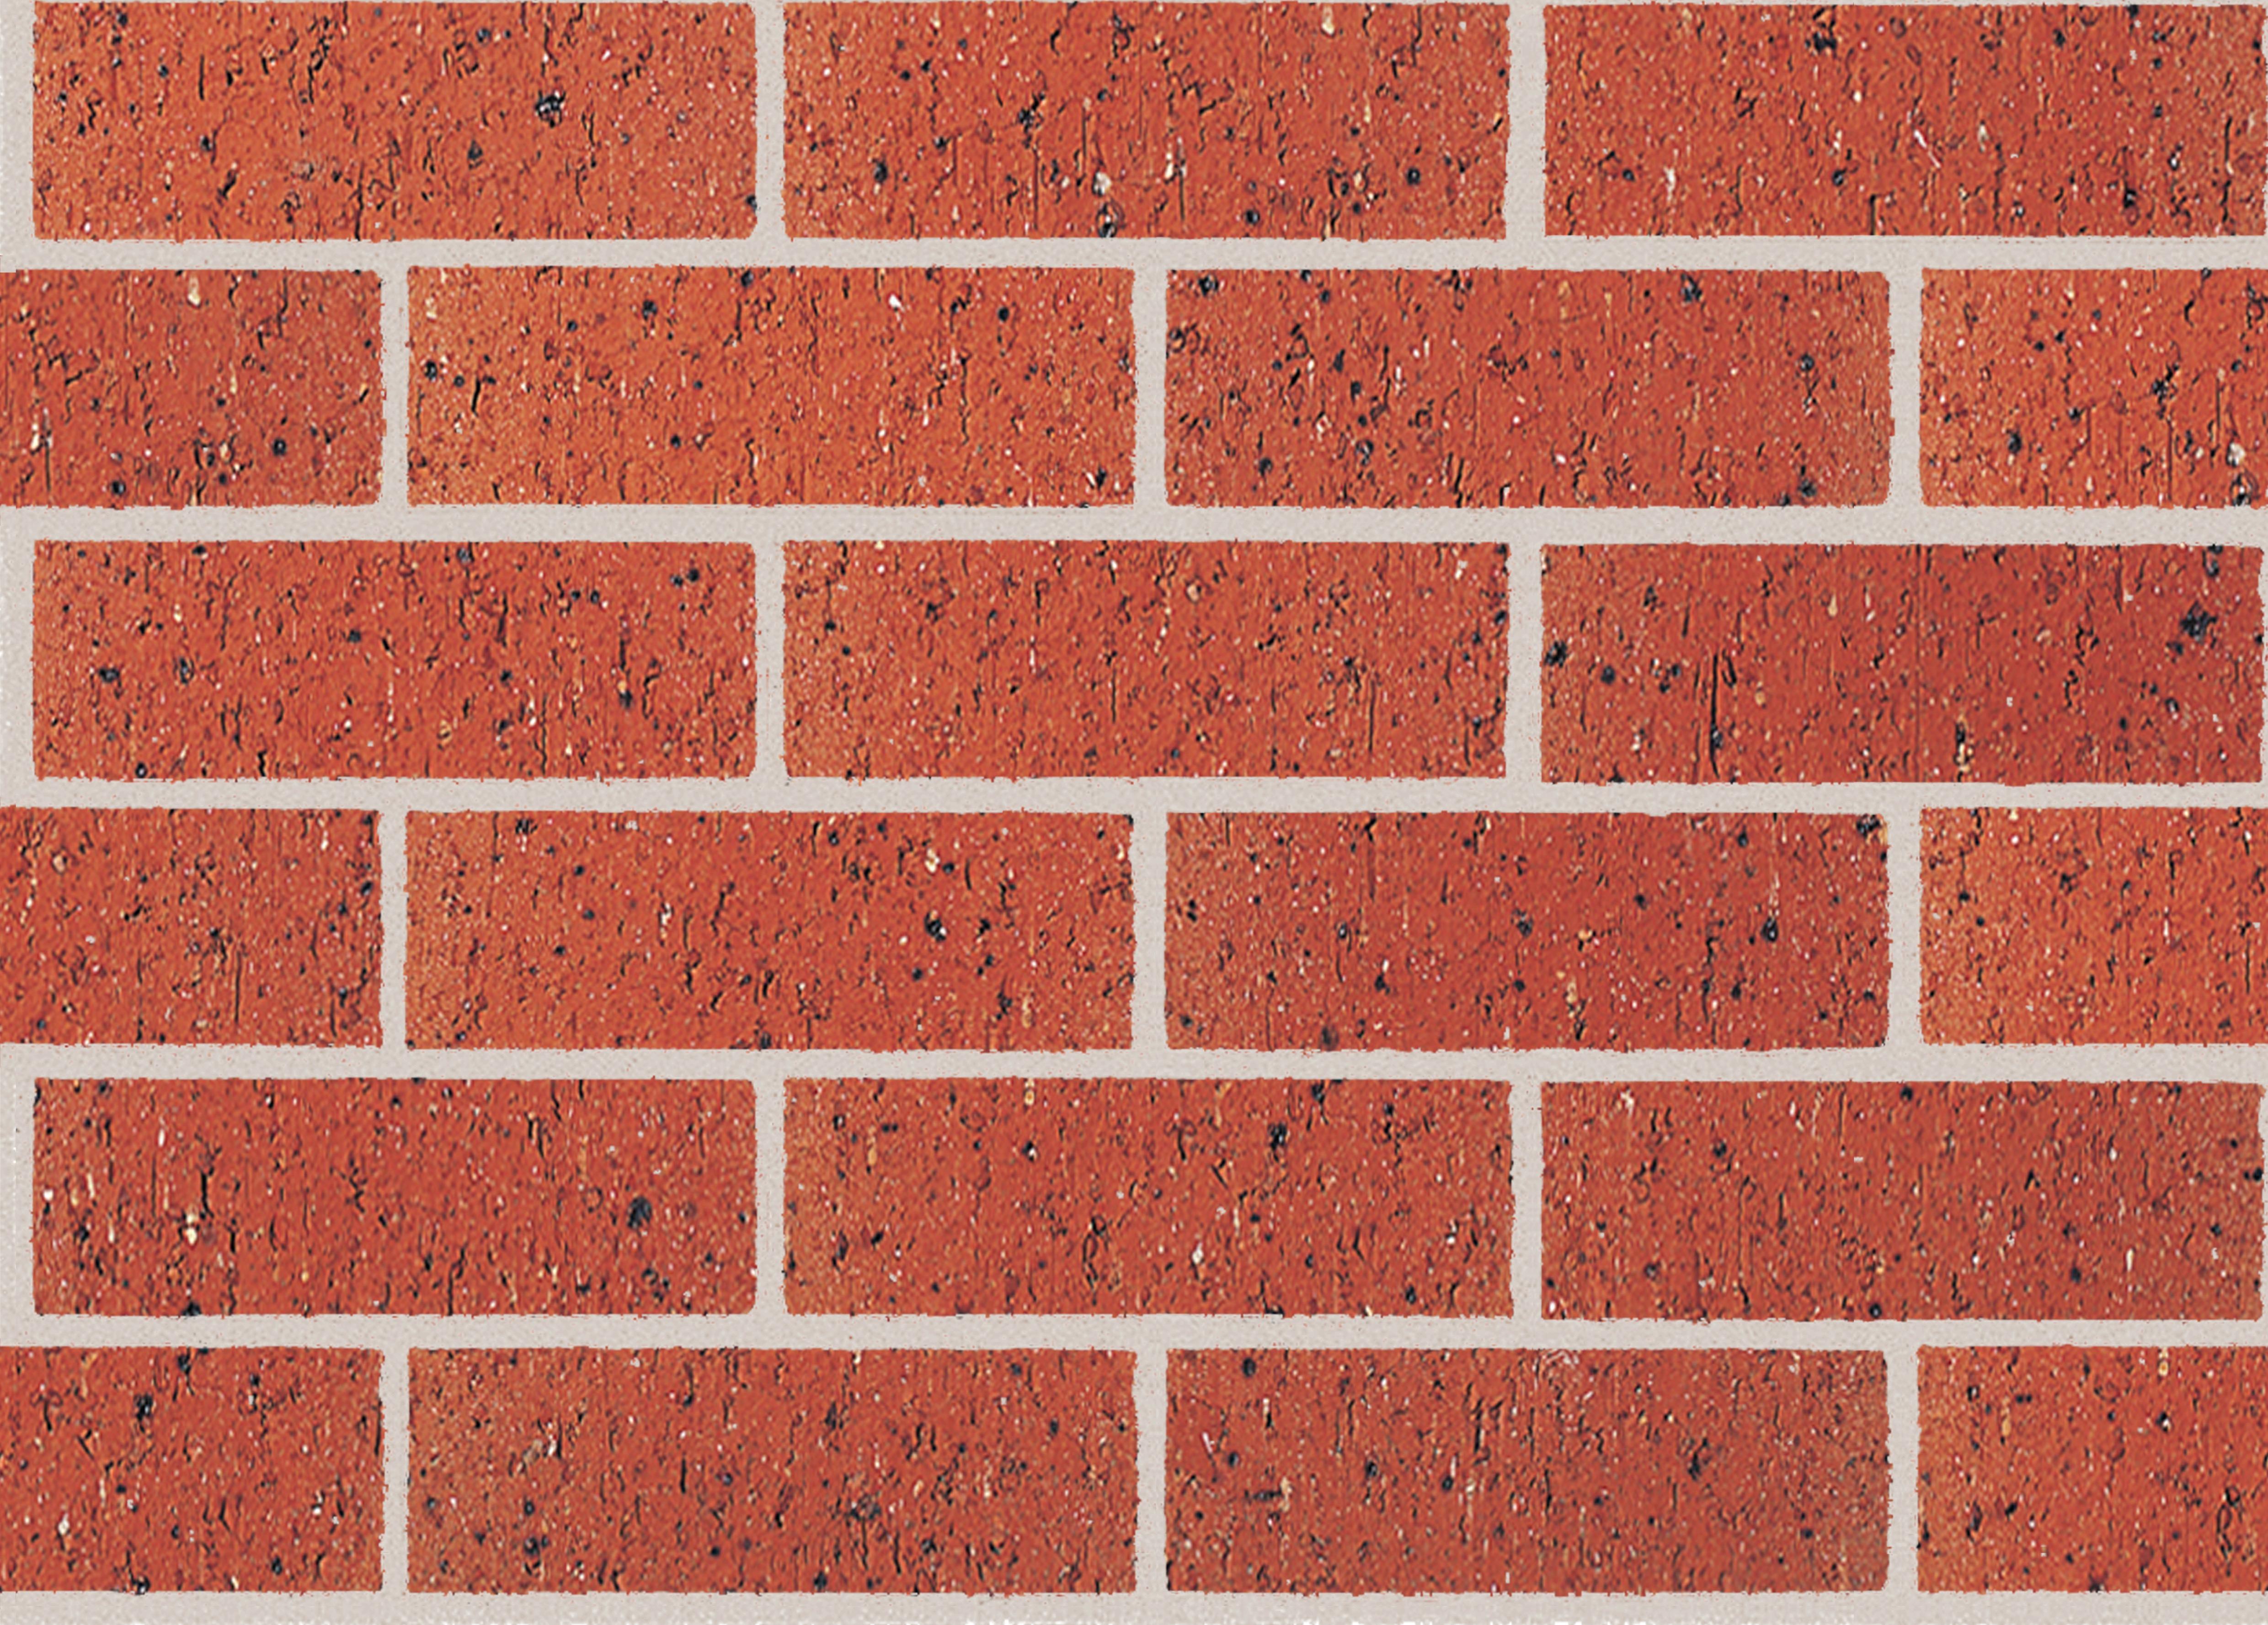 Bricks photo